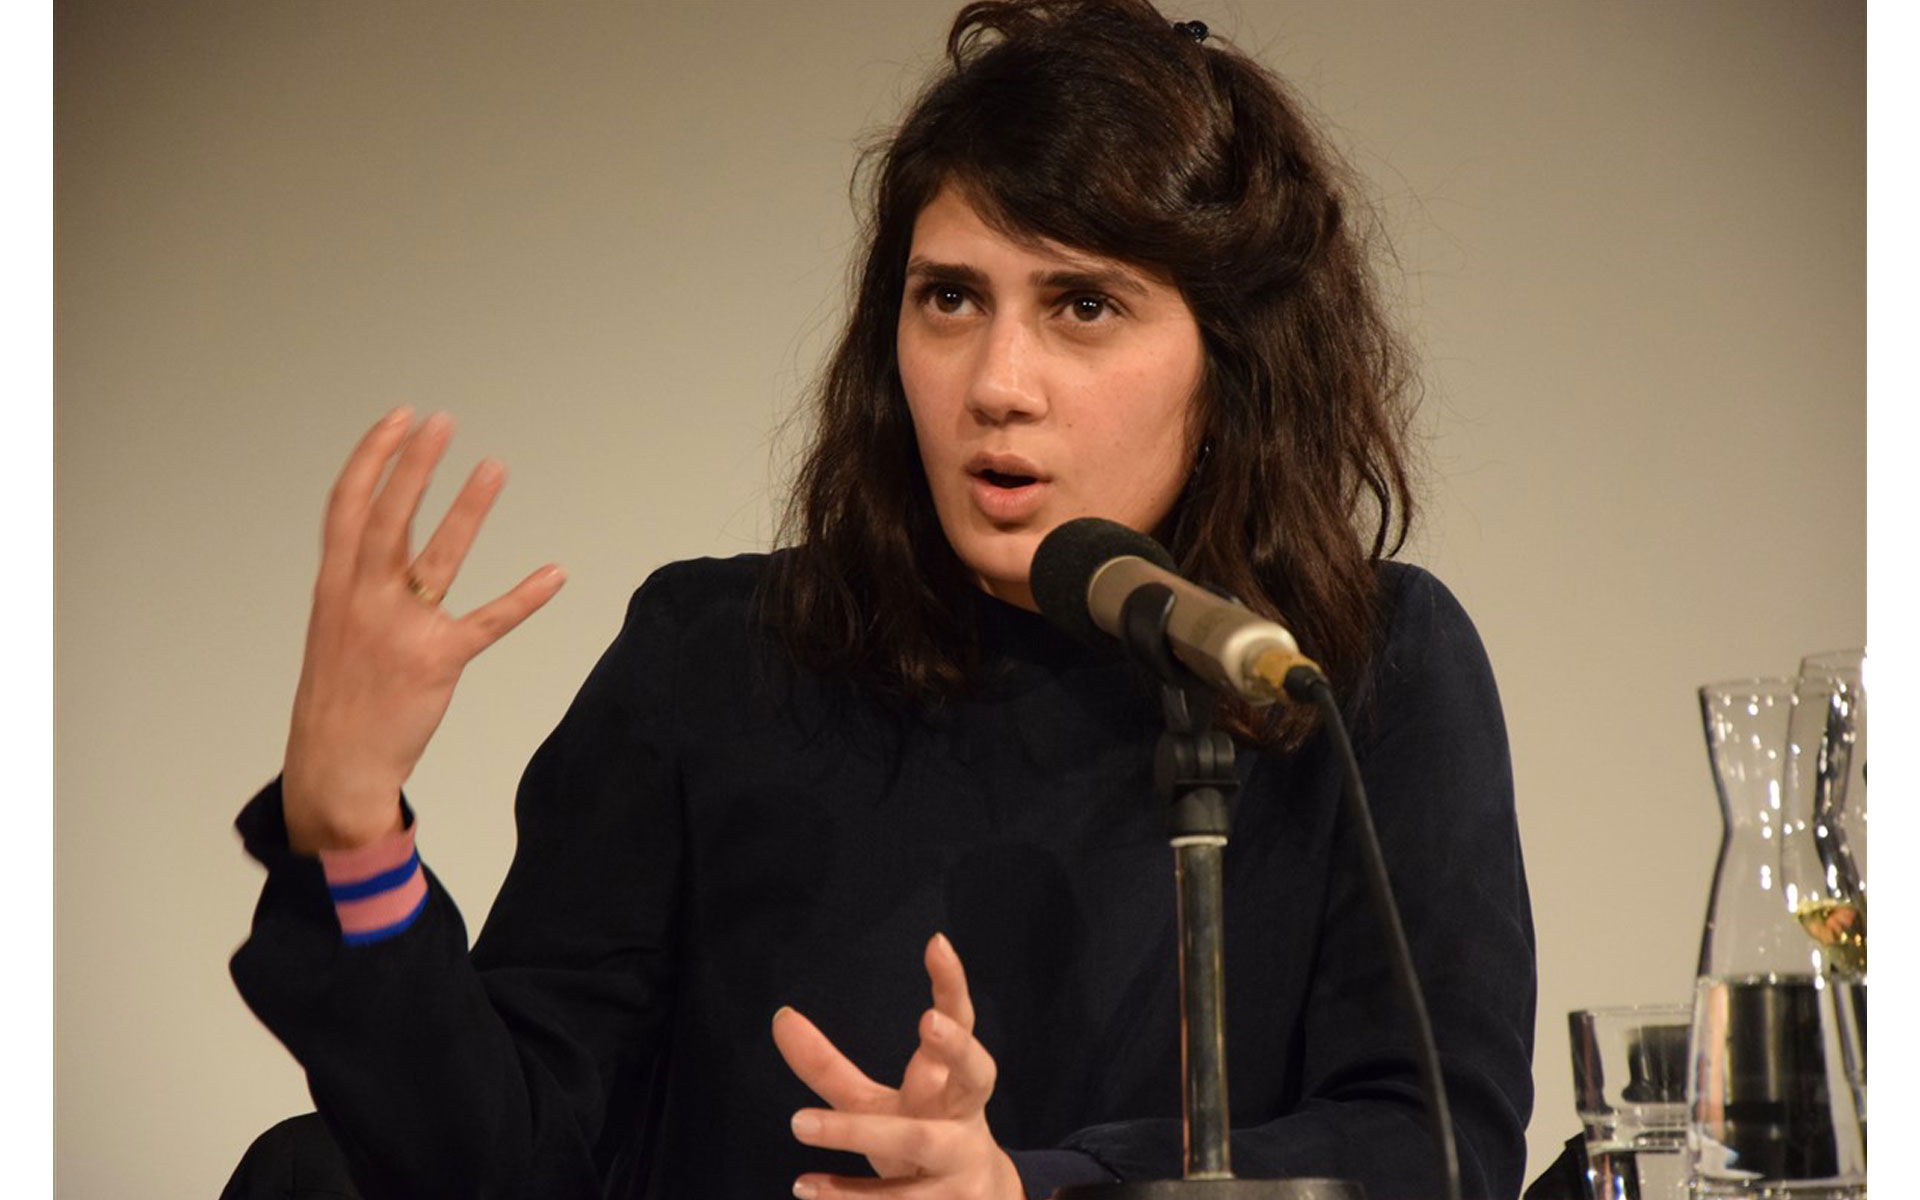 Fatma Aydemir, Deniz Utlu: Eure Heimat ist unser Albtraum <br/>(c) Simon Adolphi